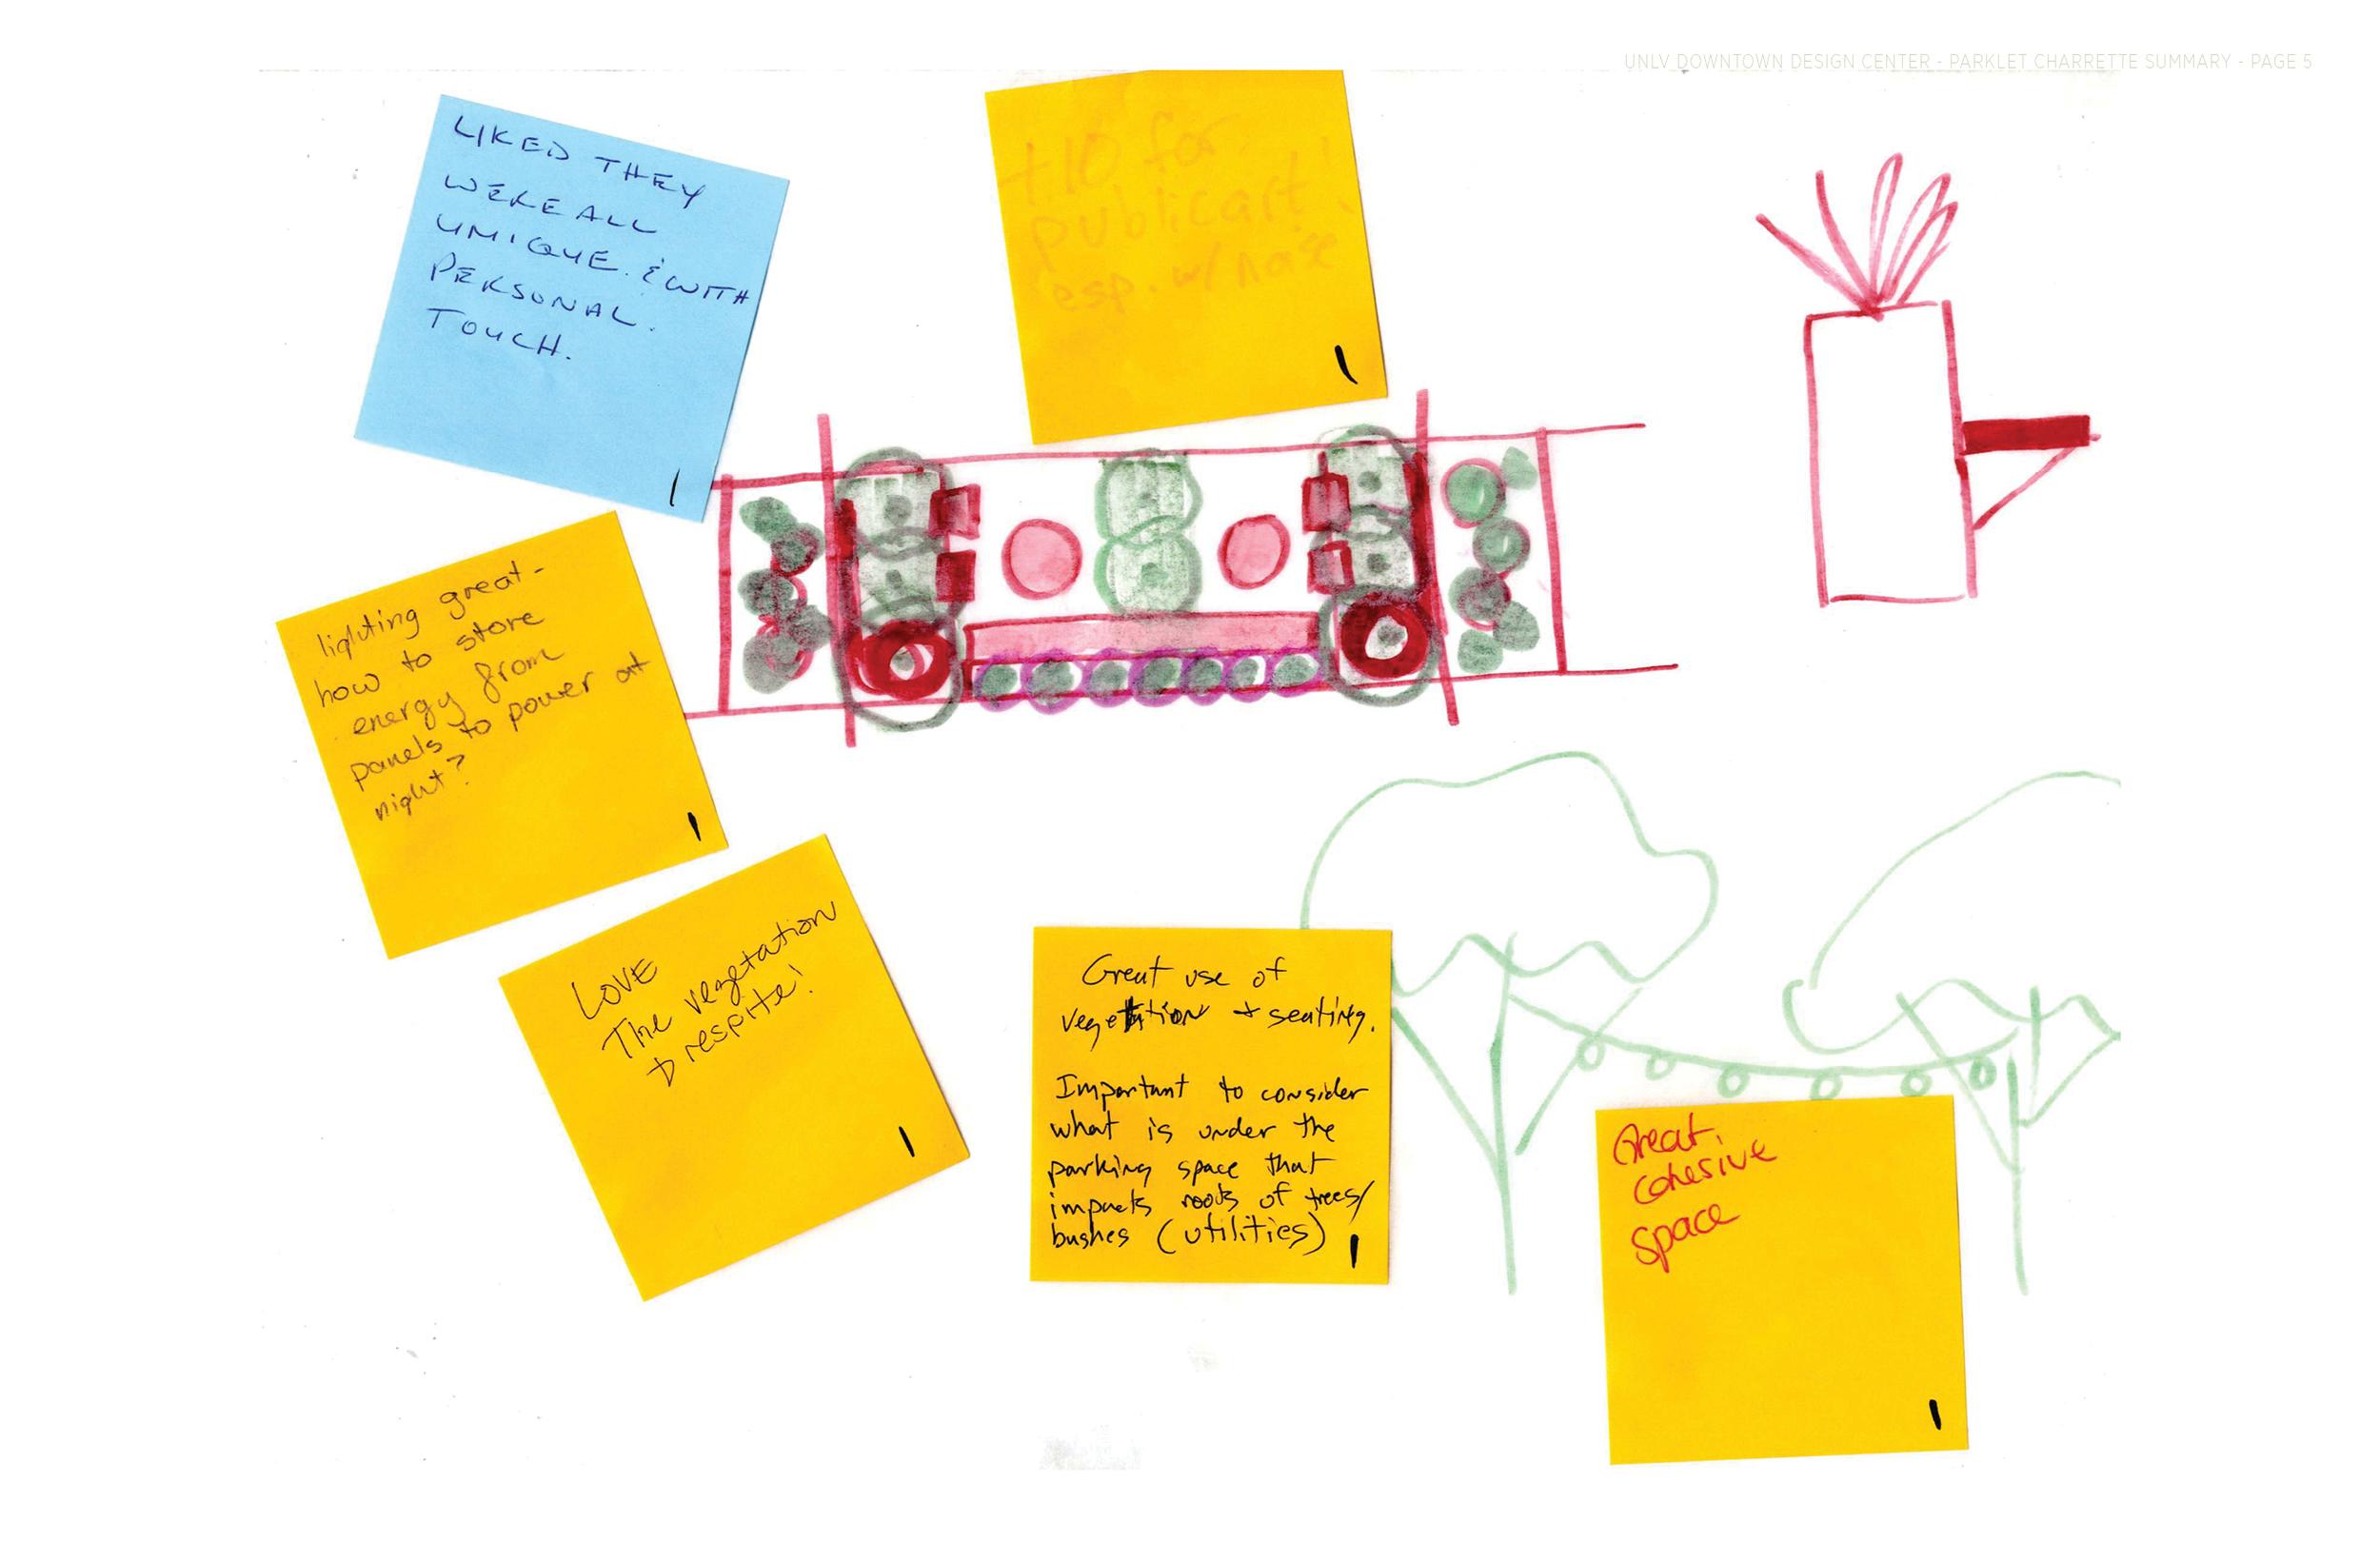 Parklet Meeting Summary7.jpg